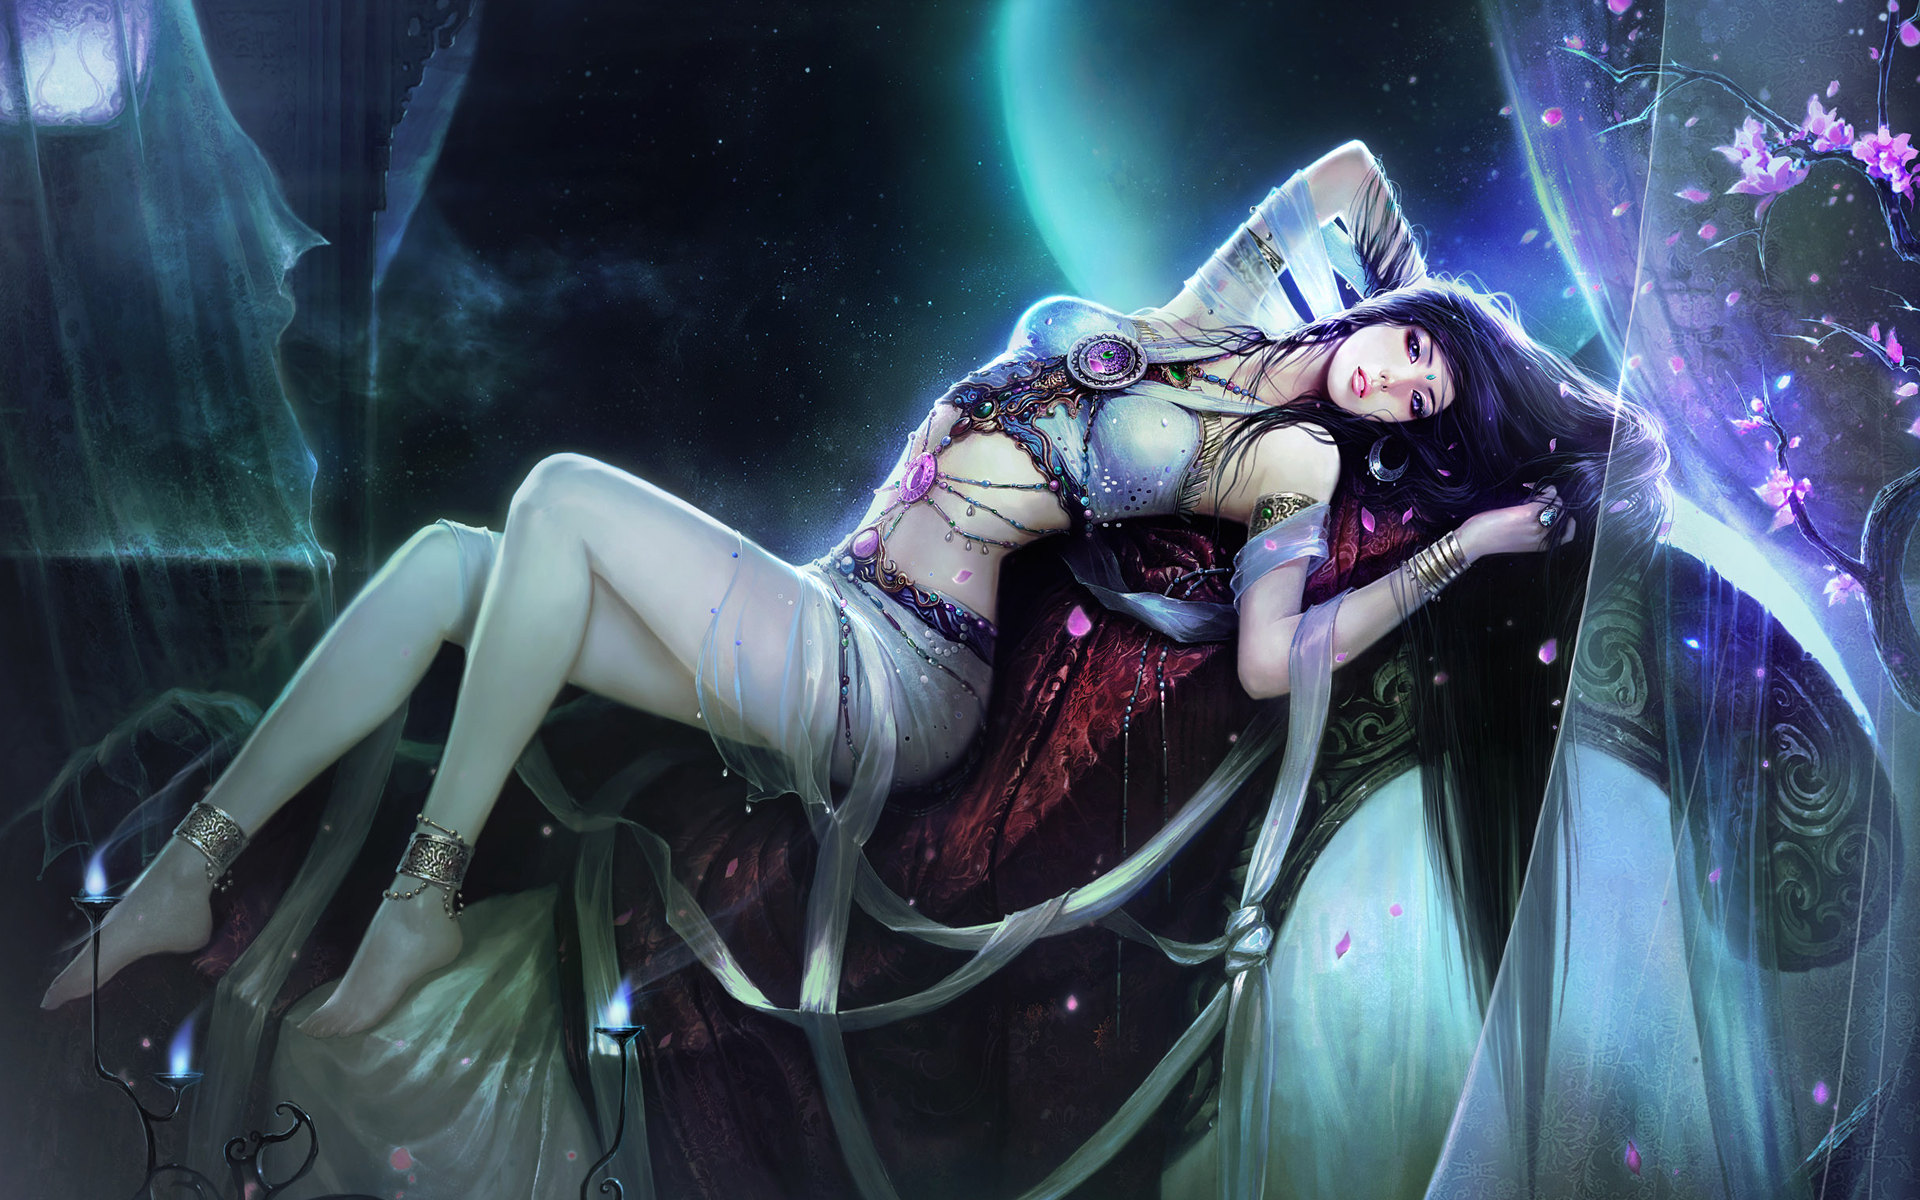 25 Beautiful Fantasy Girl Wallpapers For Your Desktop 1920x1200